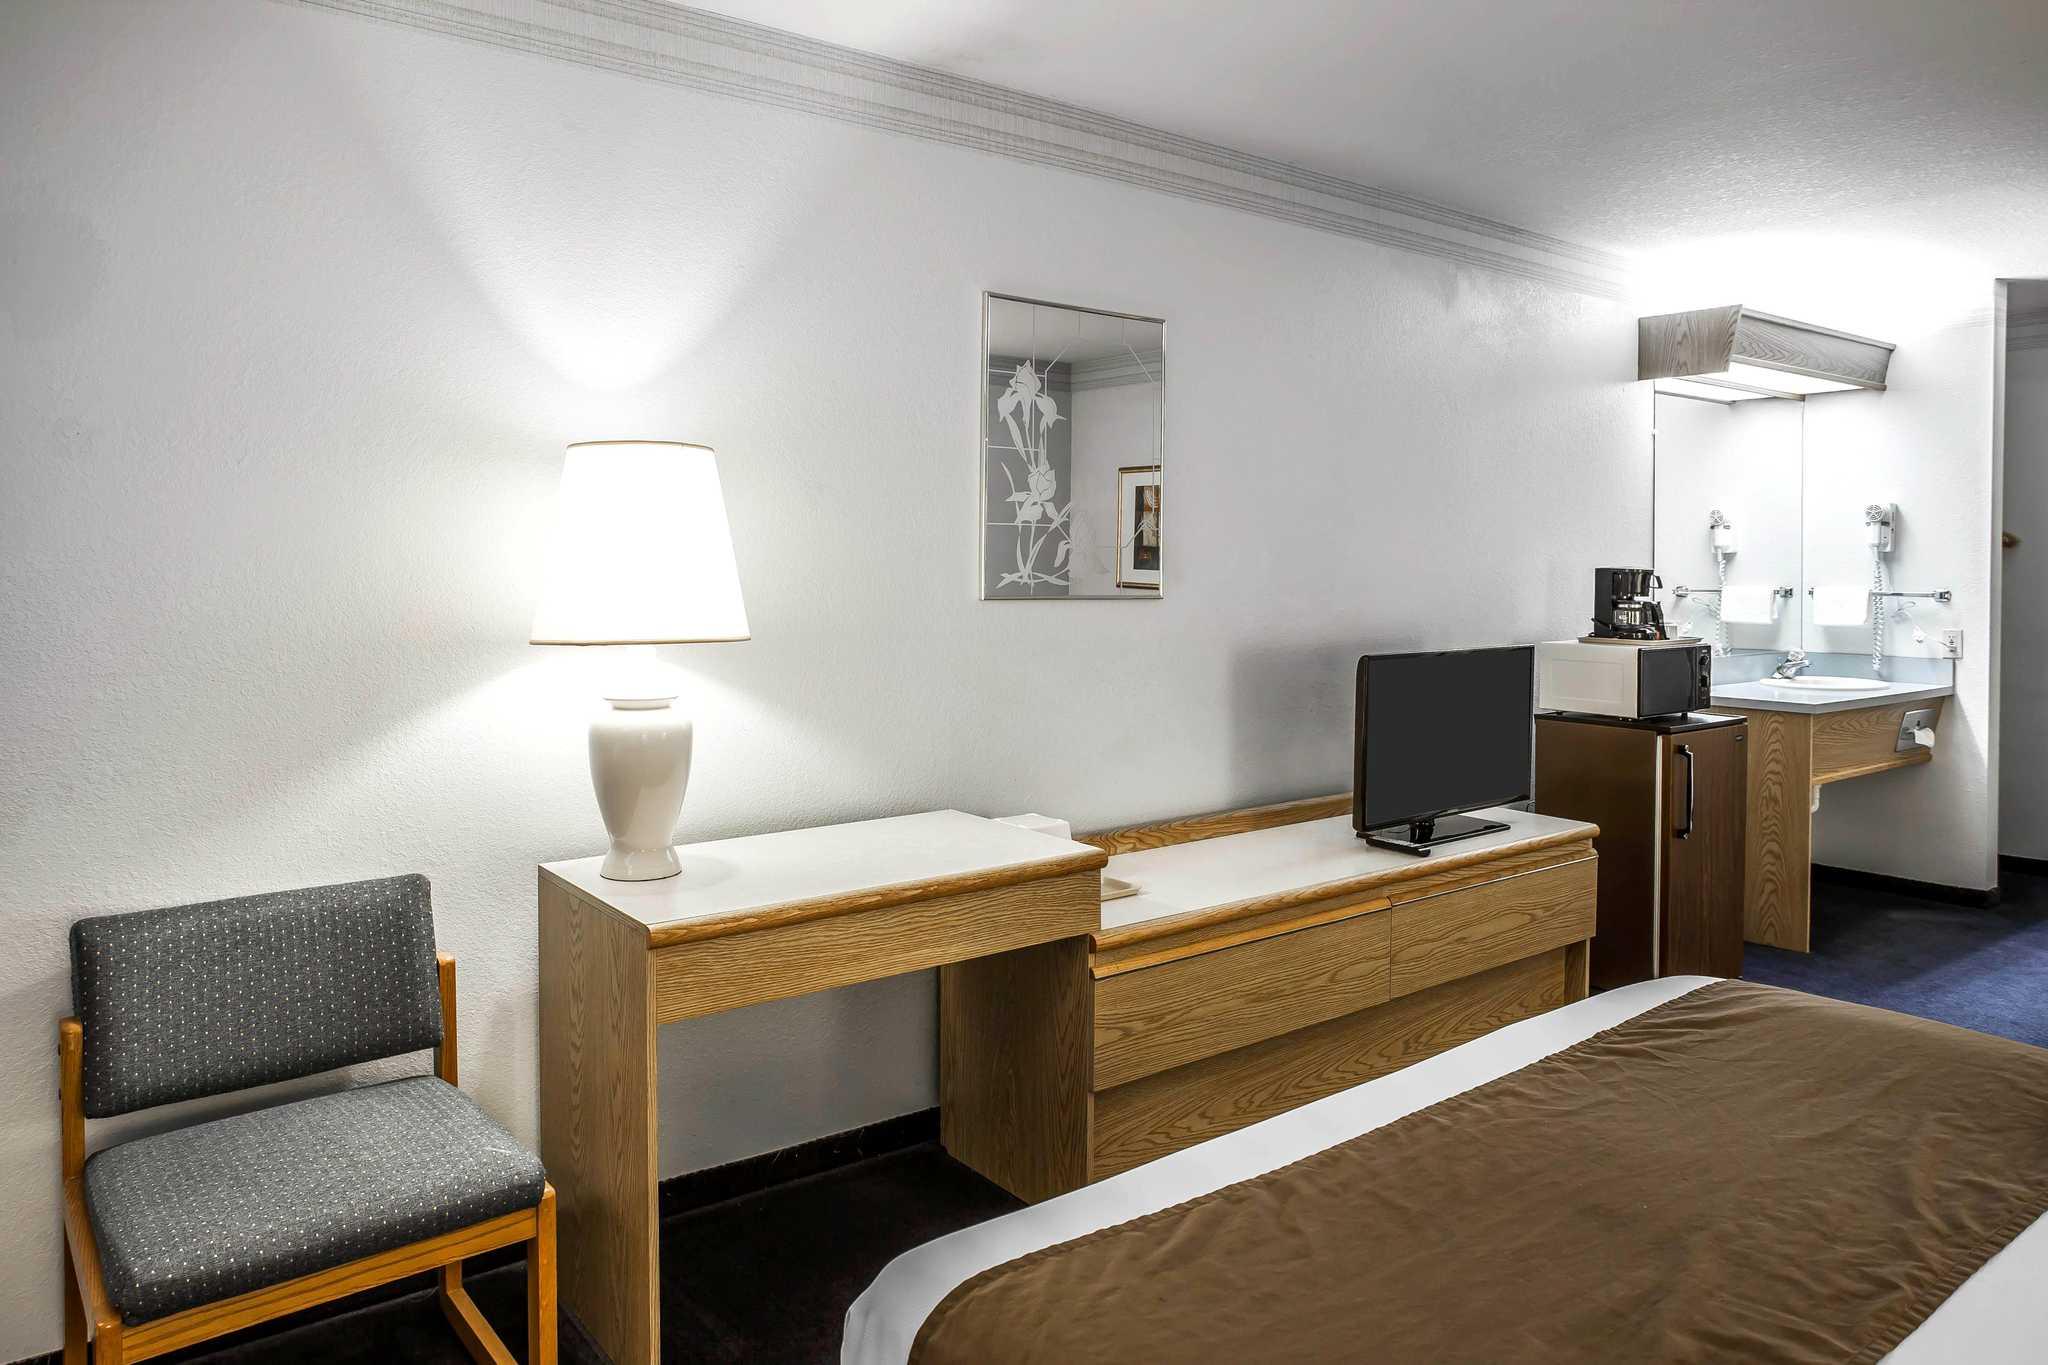 Econo Lodge image 14